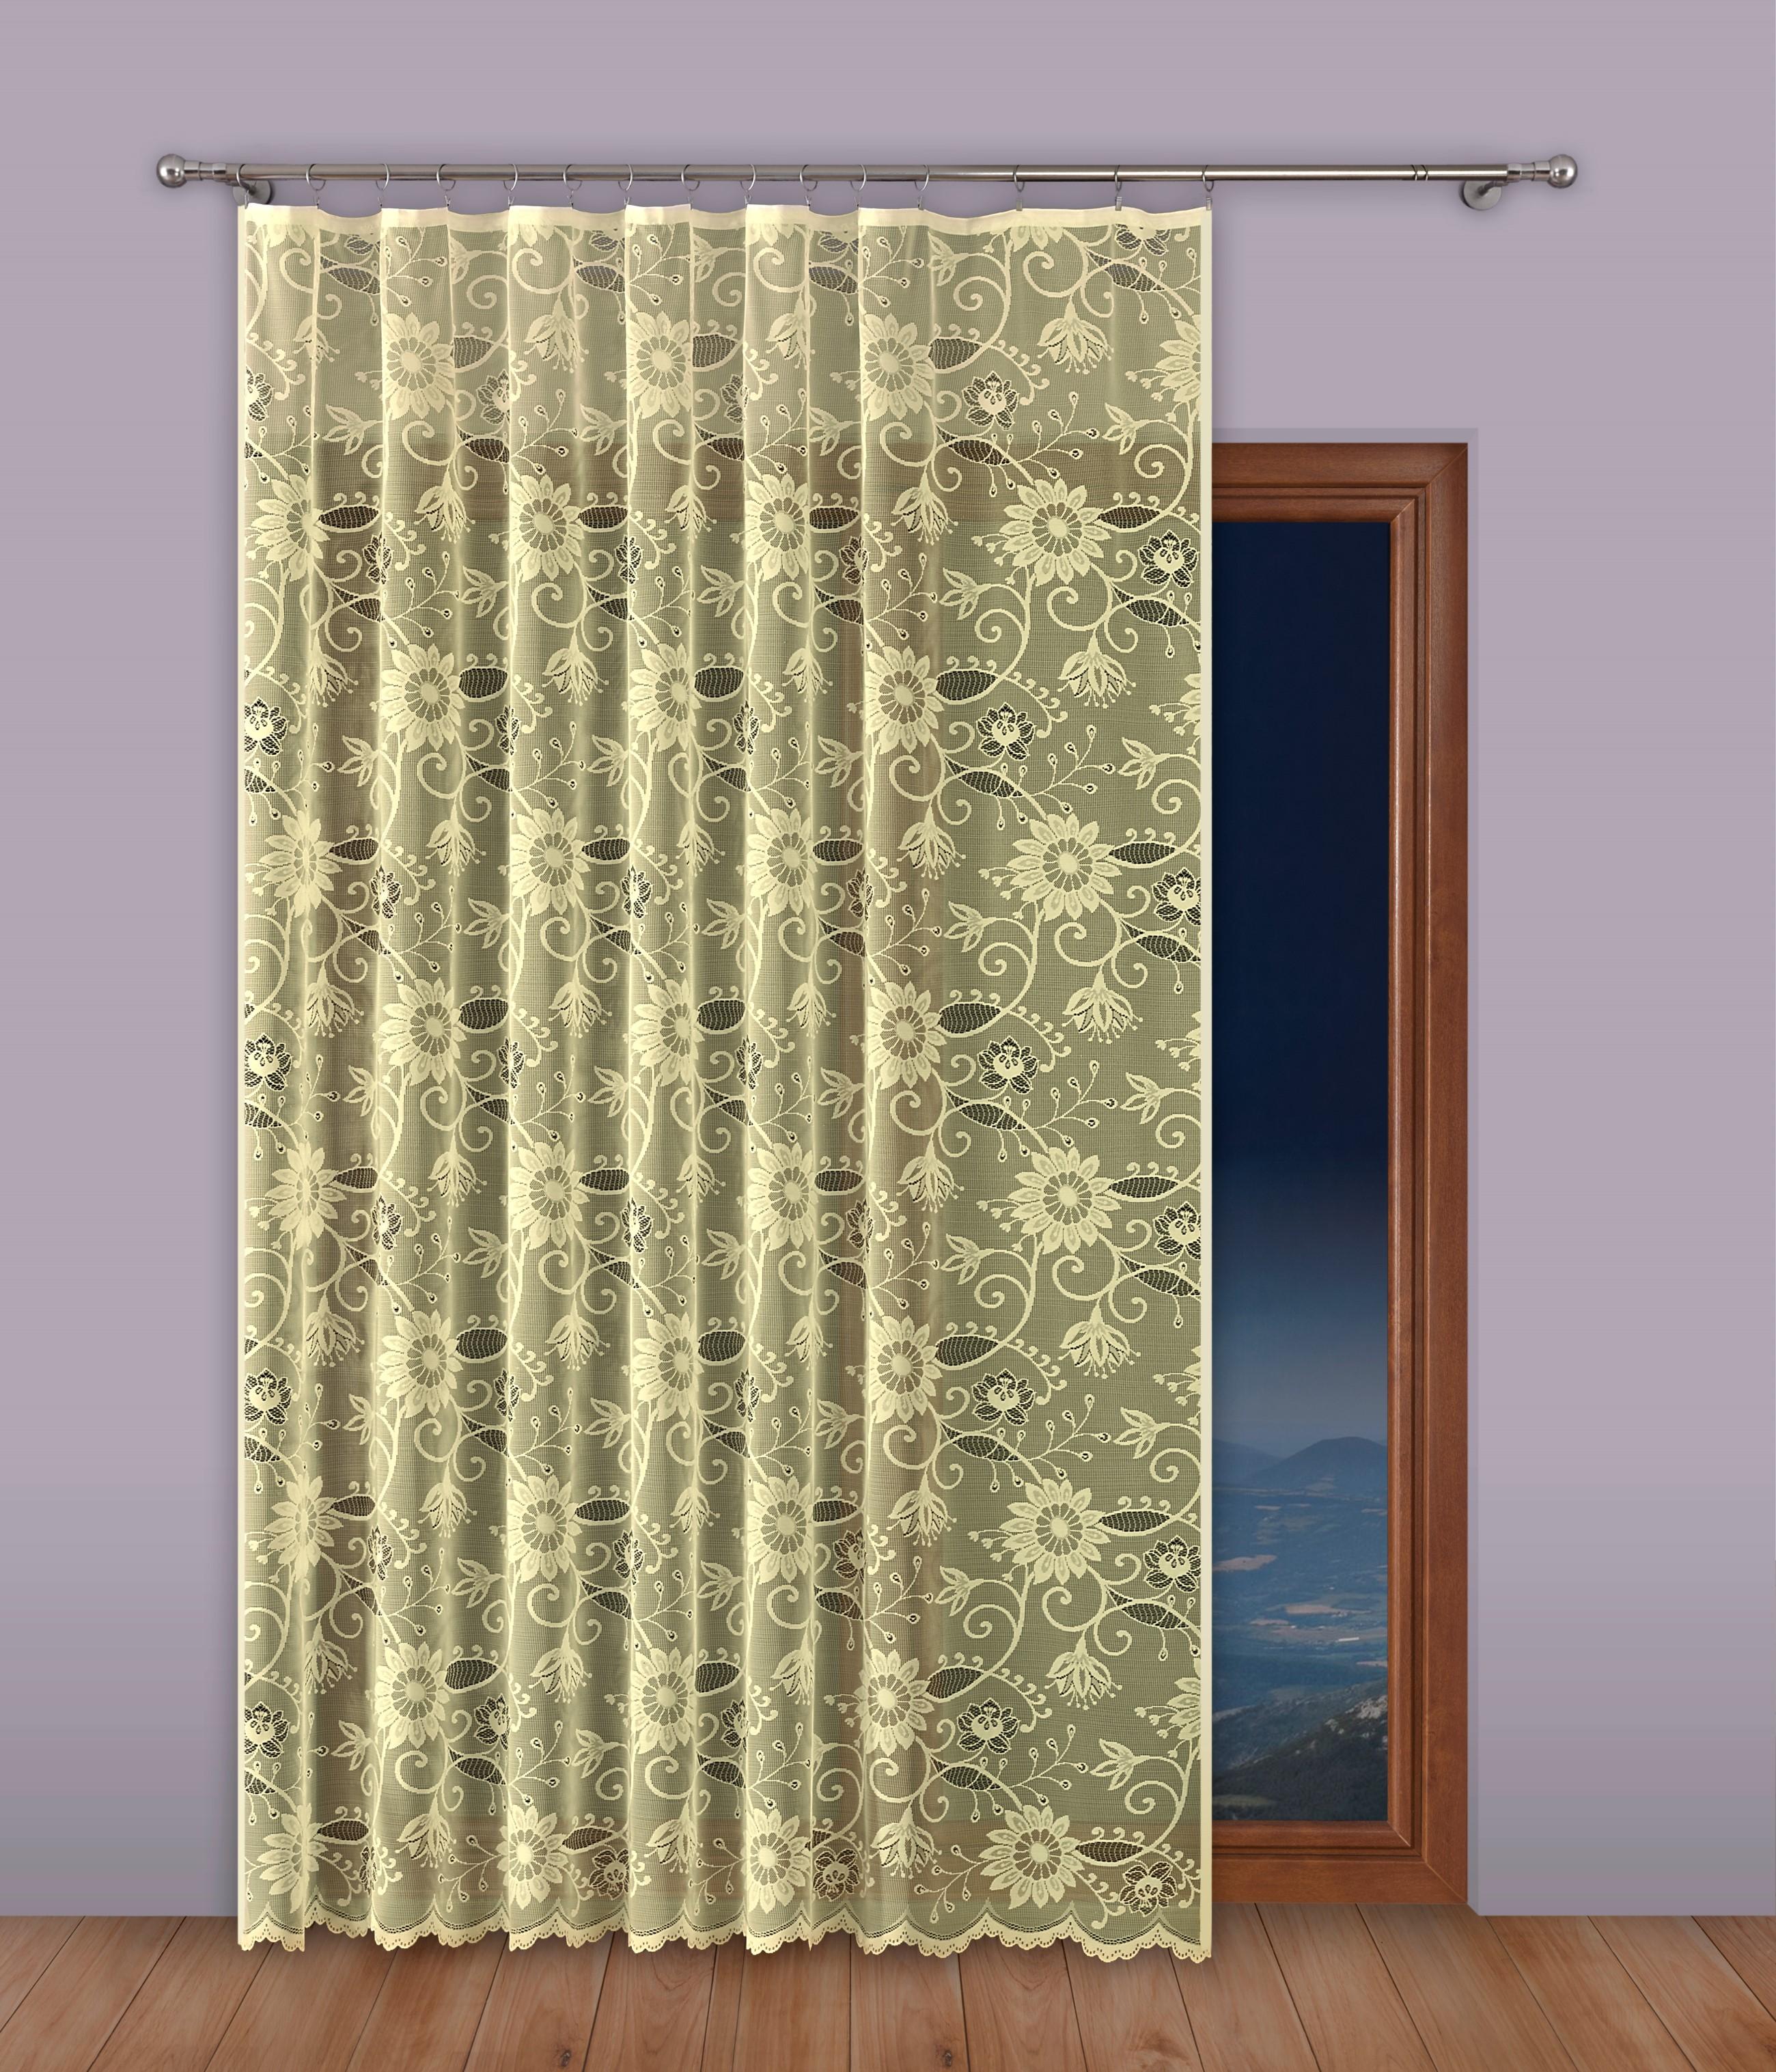 Шторы Primavera Классические шторы Beelzebub Цвет: Кремовый шторы primavera классические шторы maev цвет салатовый